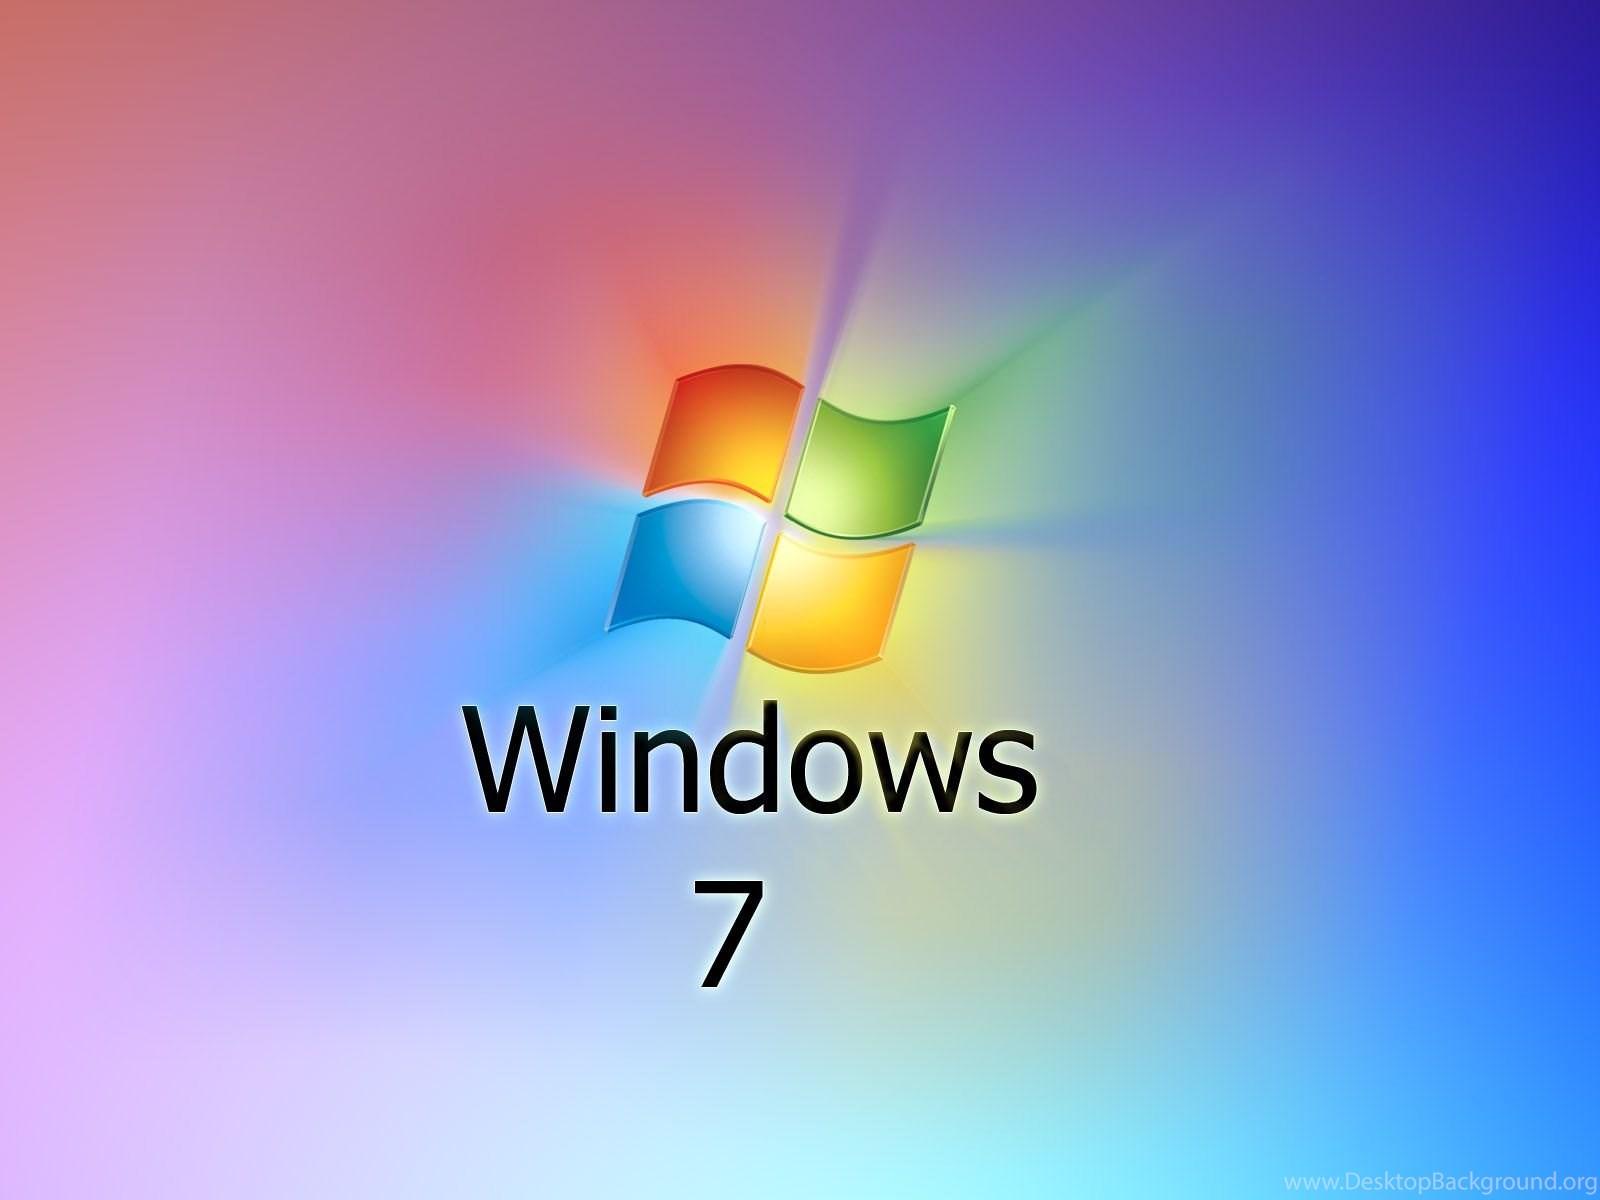 Windows 7 Wallpapers Hd Wallpapers Hd Desktop Background